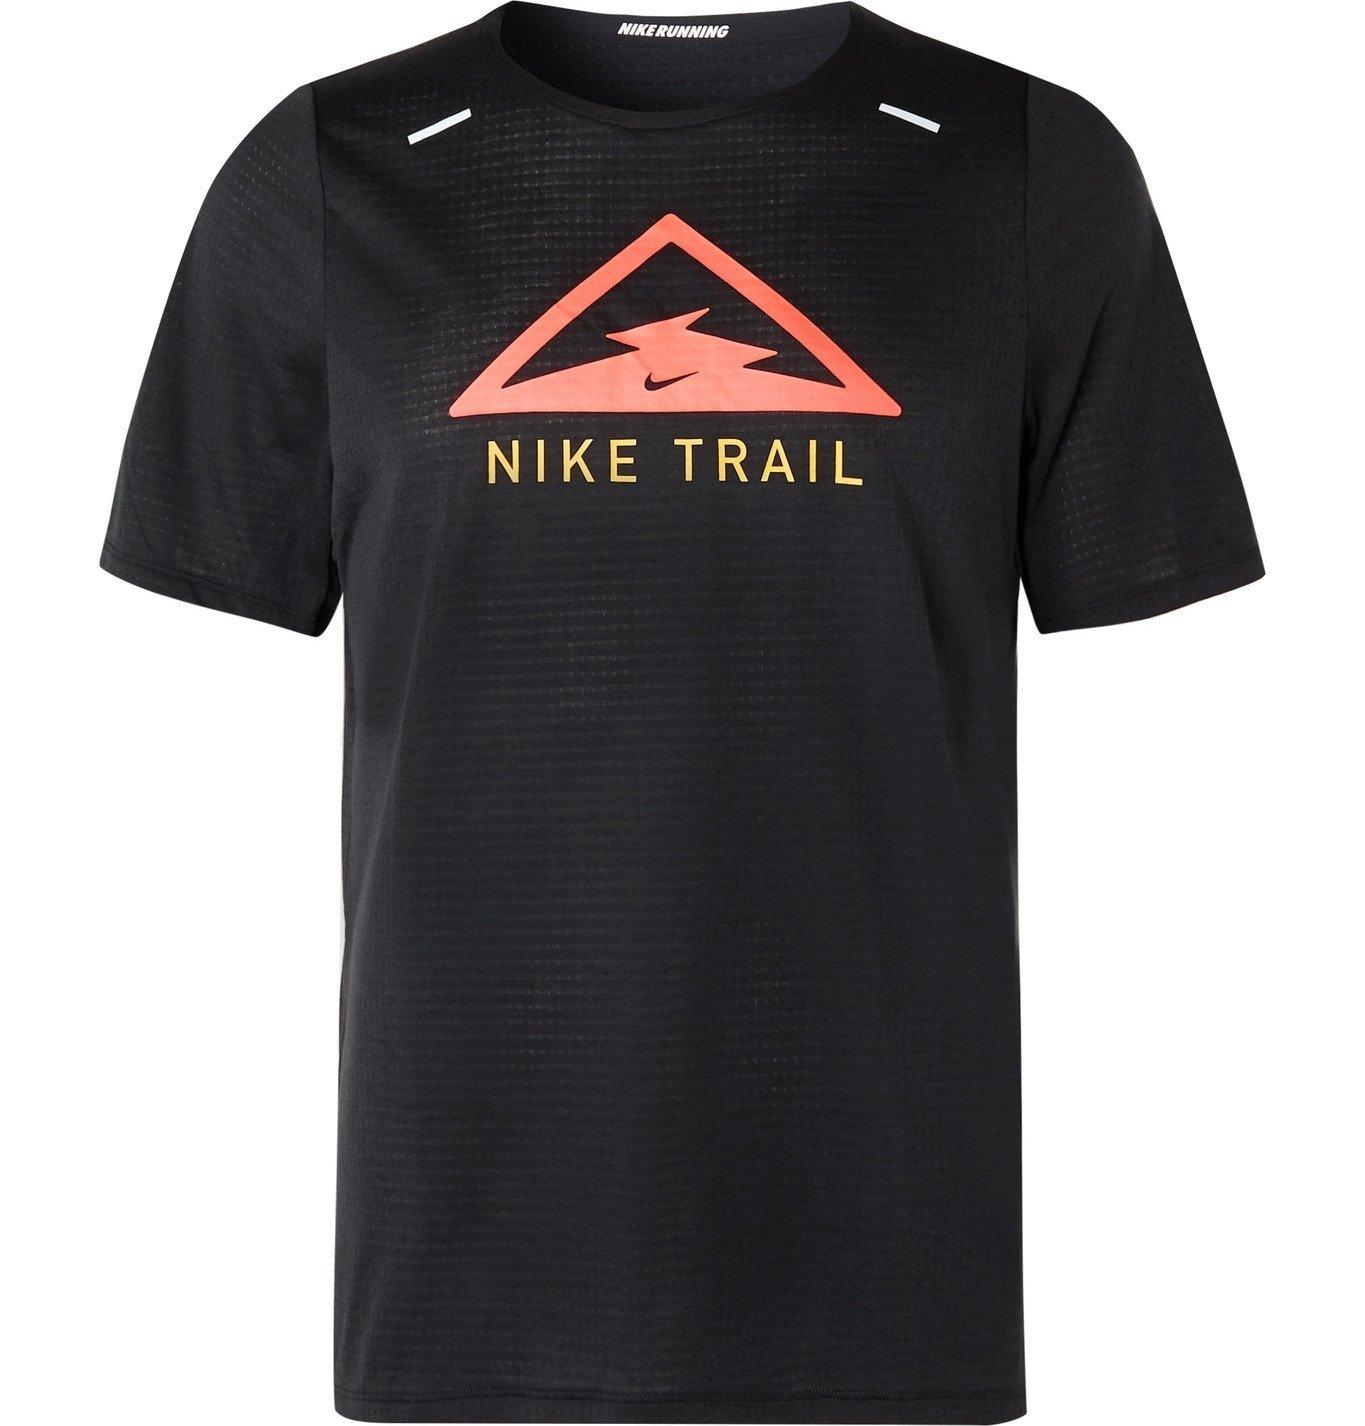 Nike Running - Rise 365 Trail Dri-FIT T-Shirt - Black